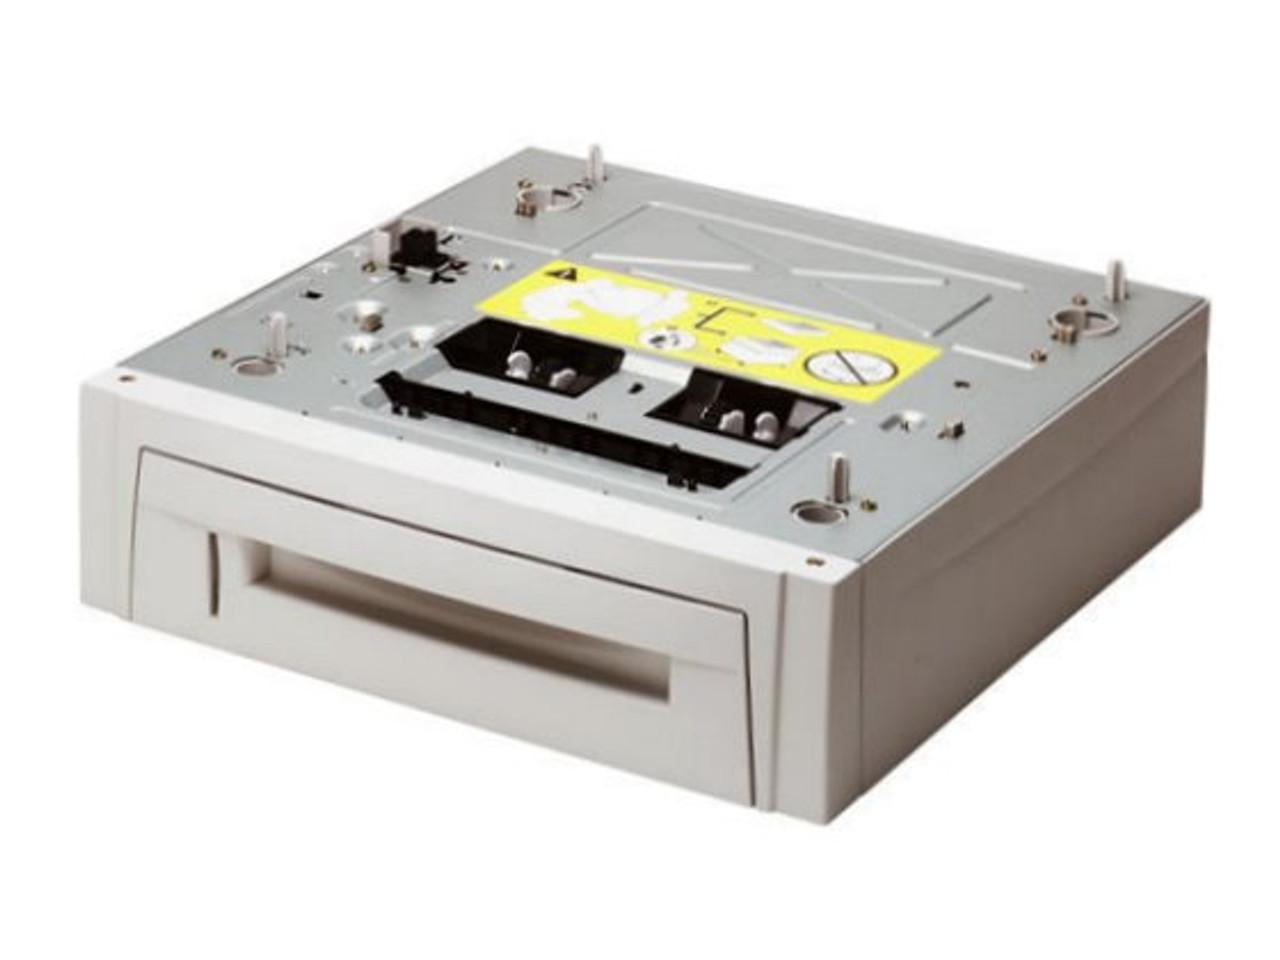 500 Sheet Optional Paper Tray 3 for HP Color LaserJet 4600